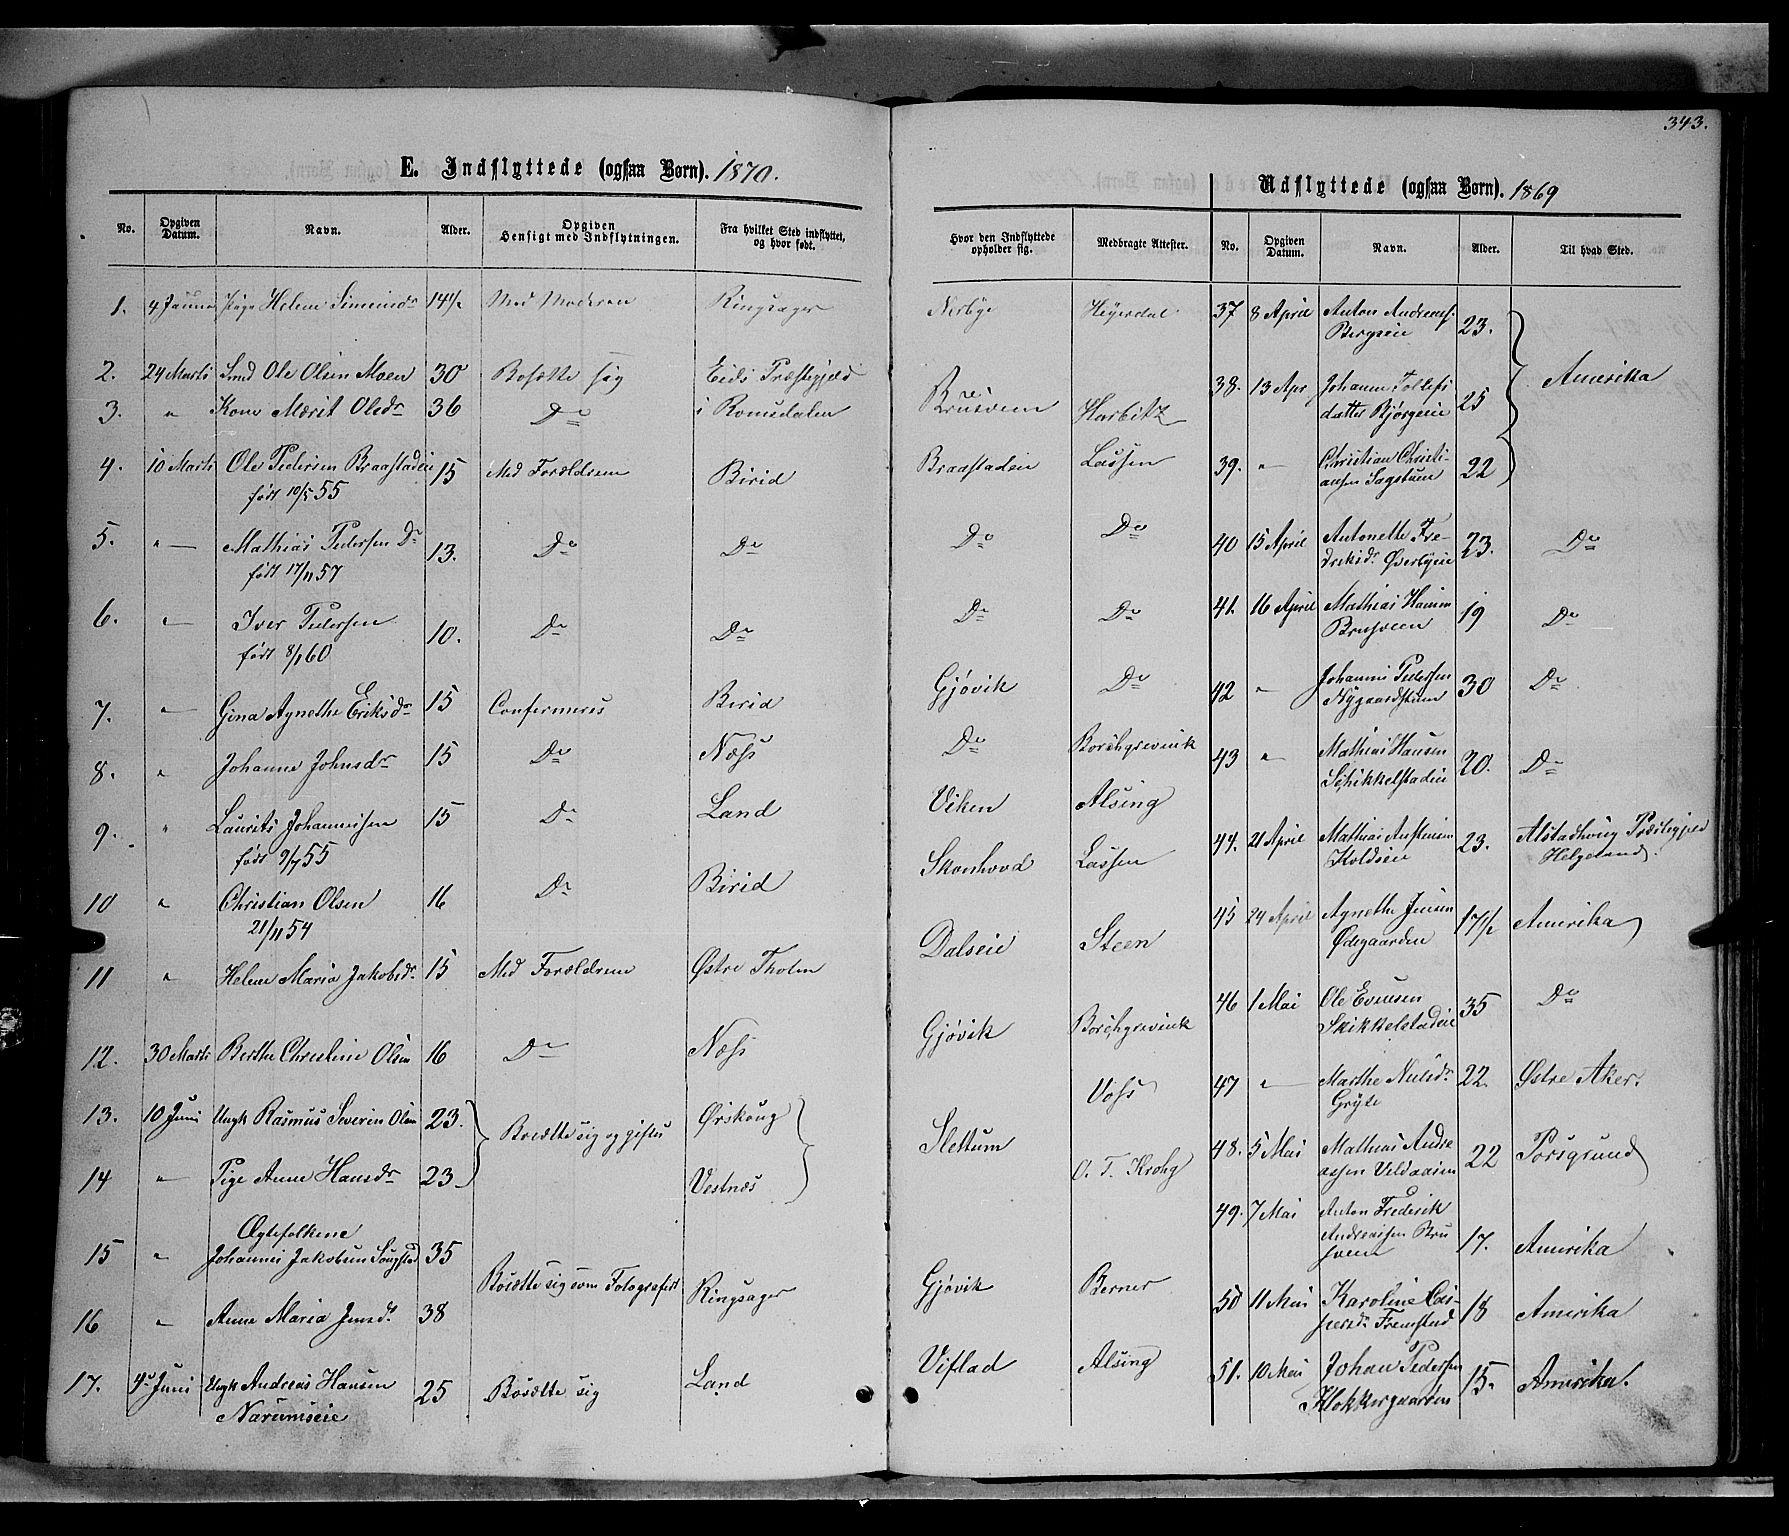 SAH, Vardal prestekontor, H/Ha/Hab/L0006: Klokkerbok nr. 6, 1869-1881, s. 343